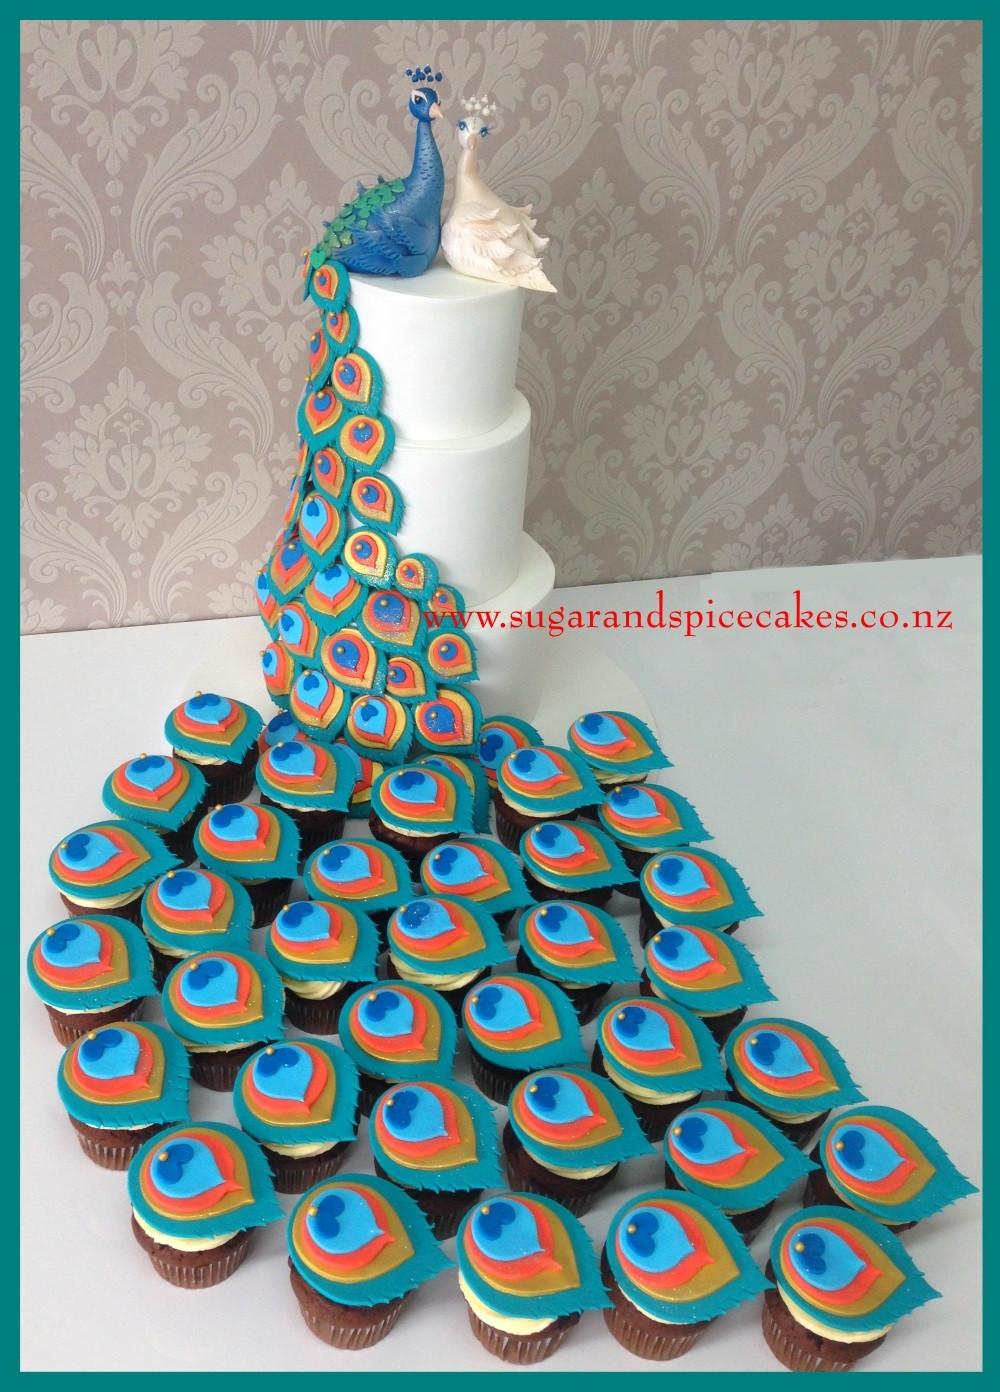 Peacock Wedding Cake With Cupcakes  Peacock Wedding Cake With Matching Cupcakes CakeCentral